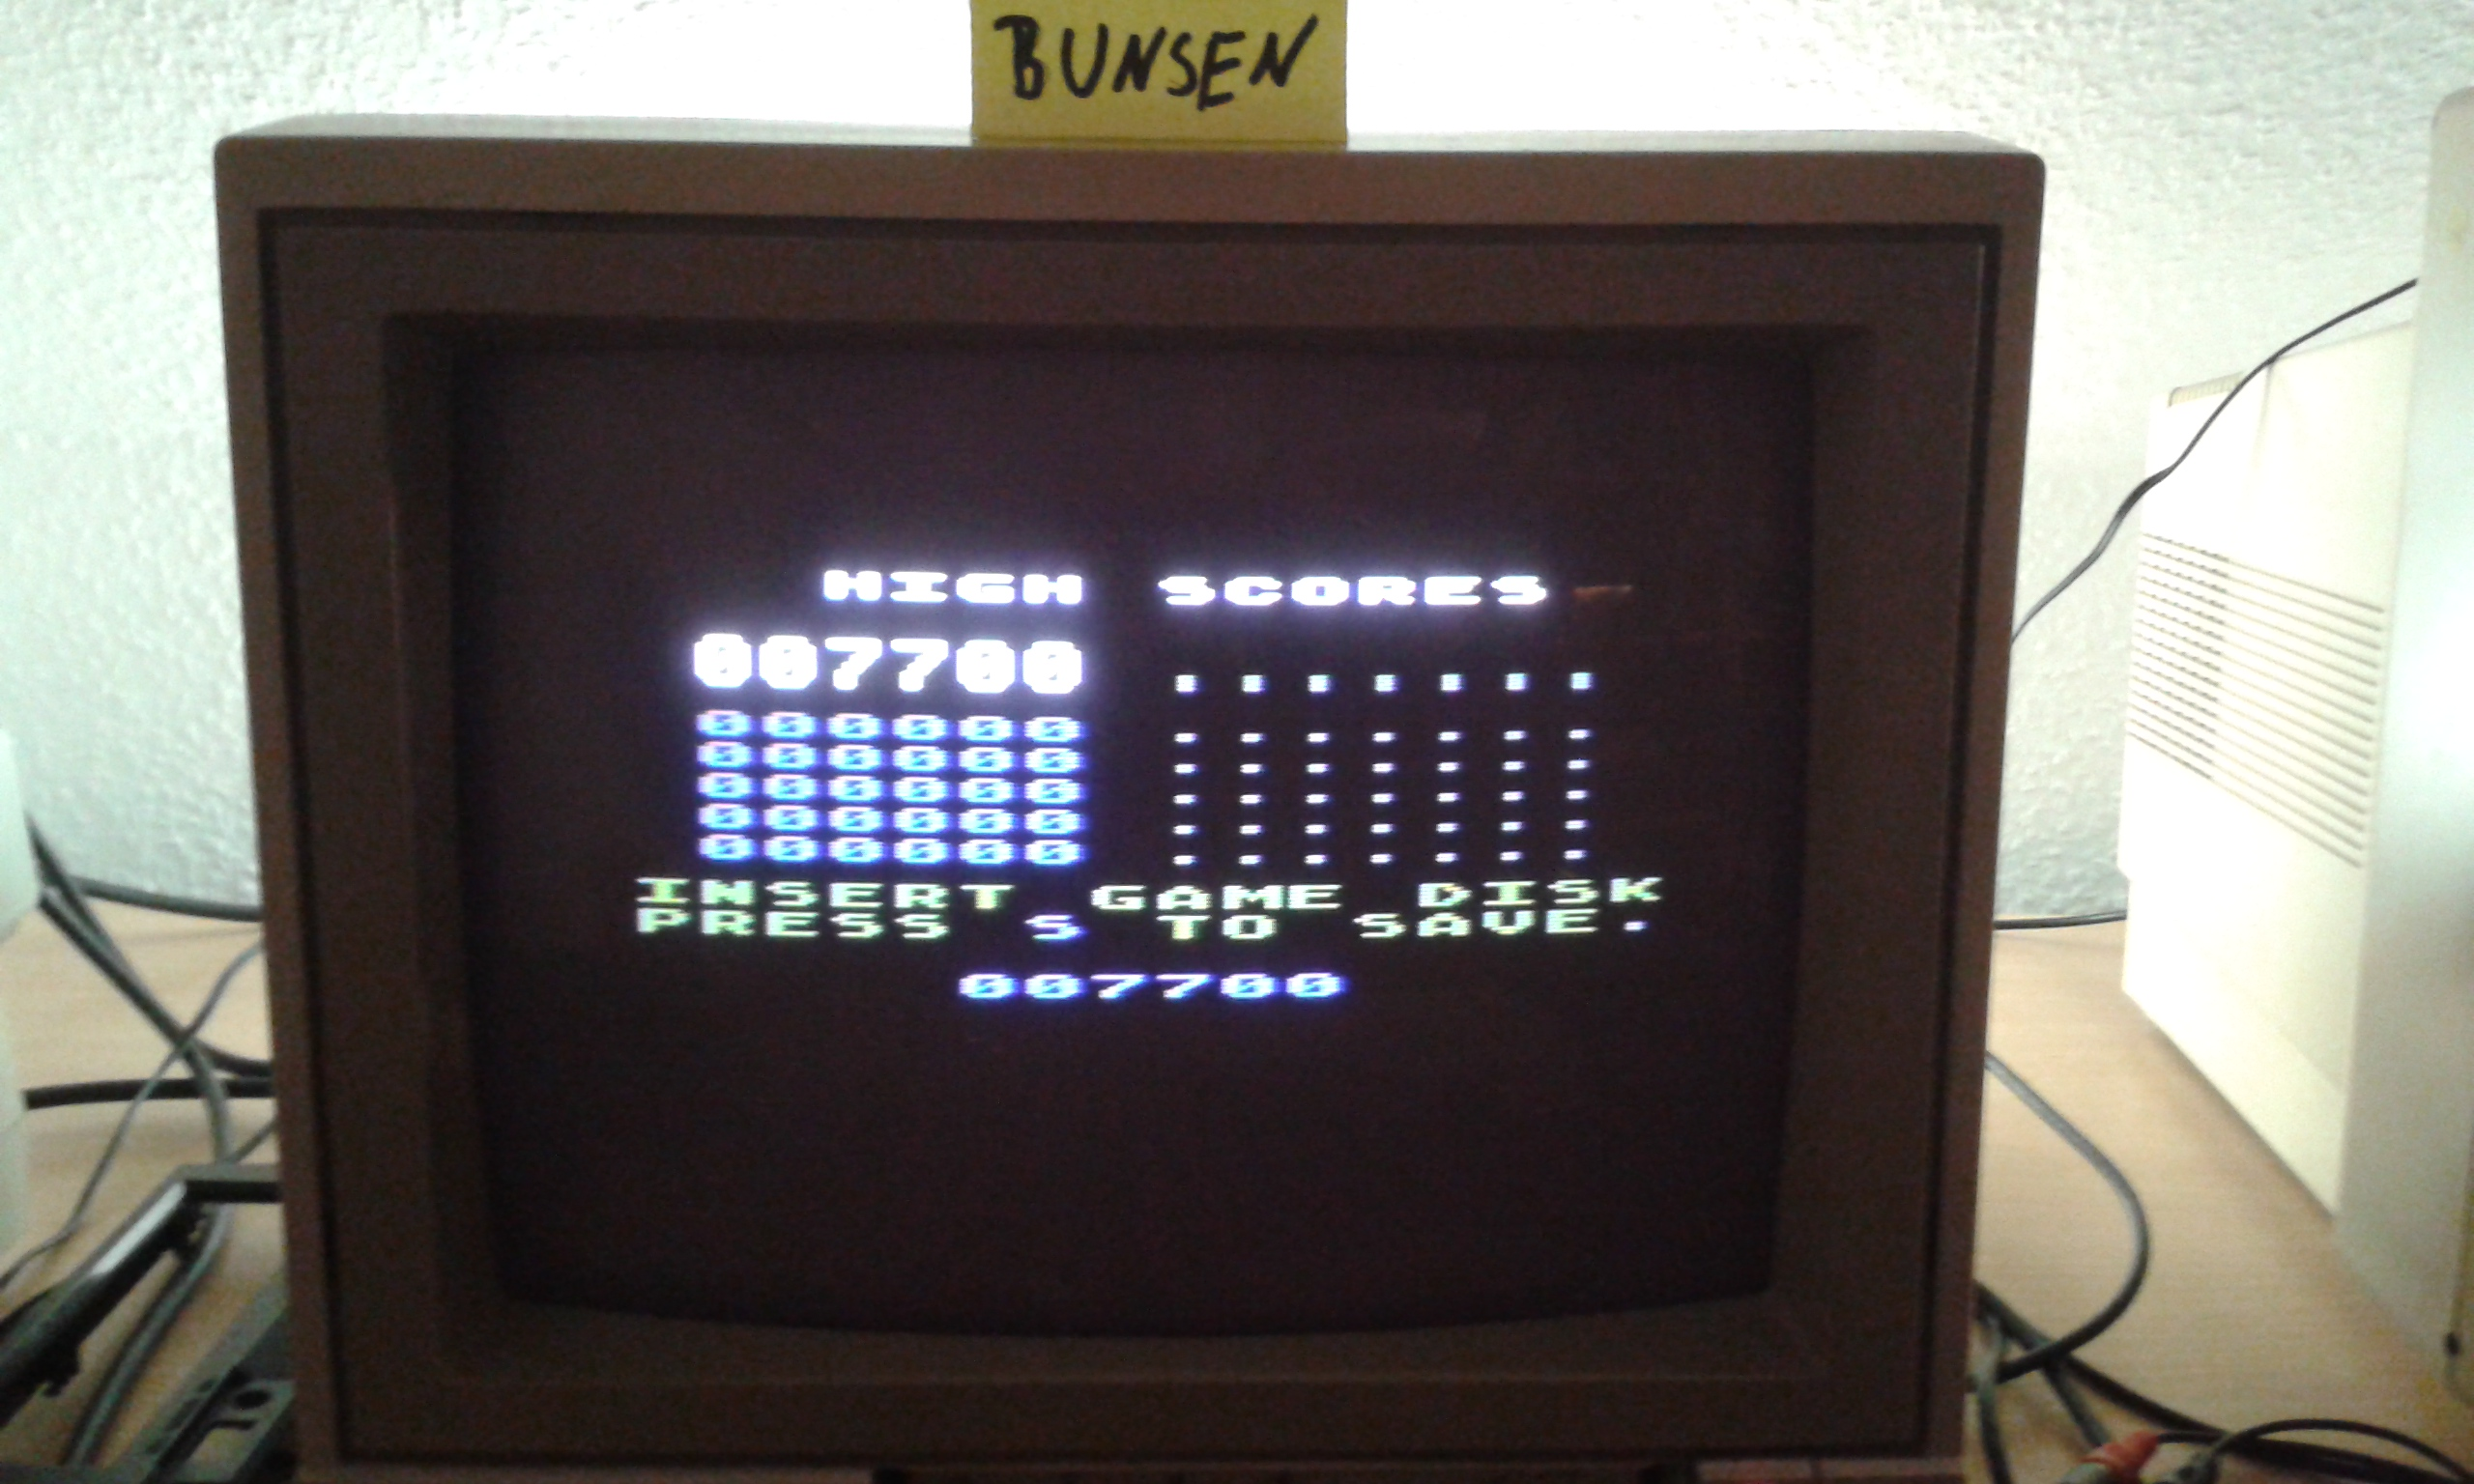 Bunsen: Livewire 2 (Atari 400/800/XL/XE) 7,700 points on 2015-10-30 14:24:17